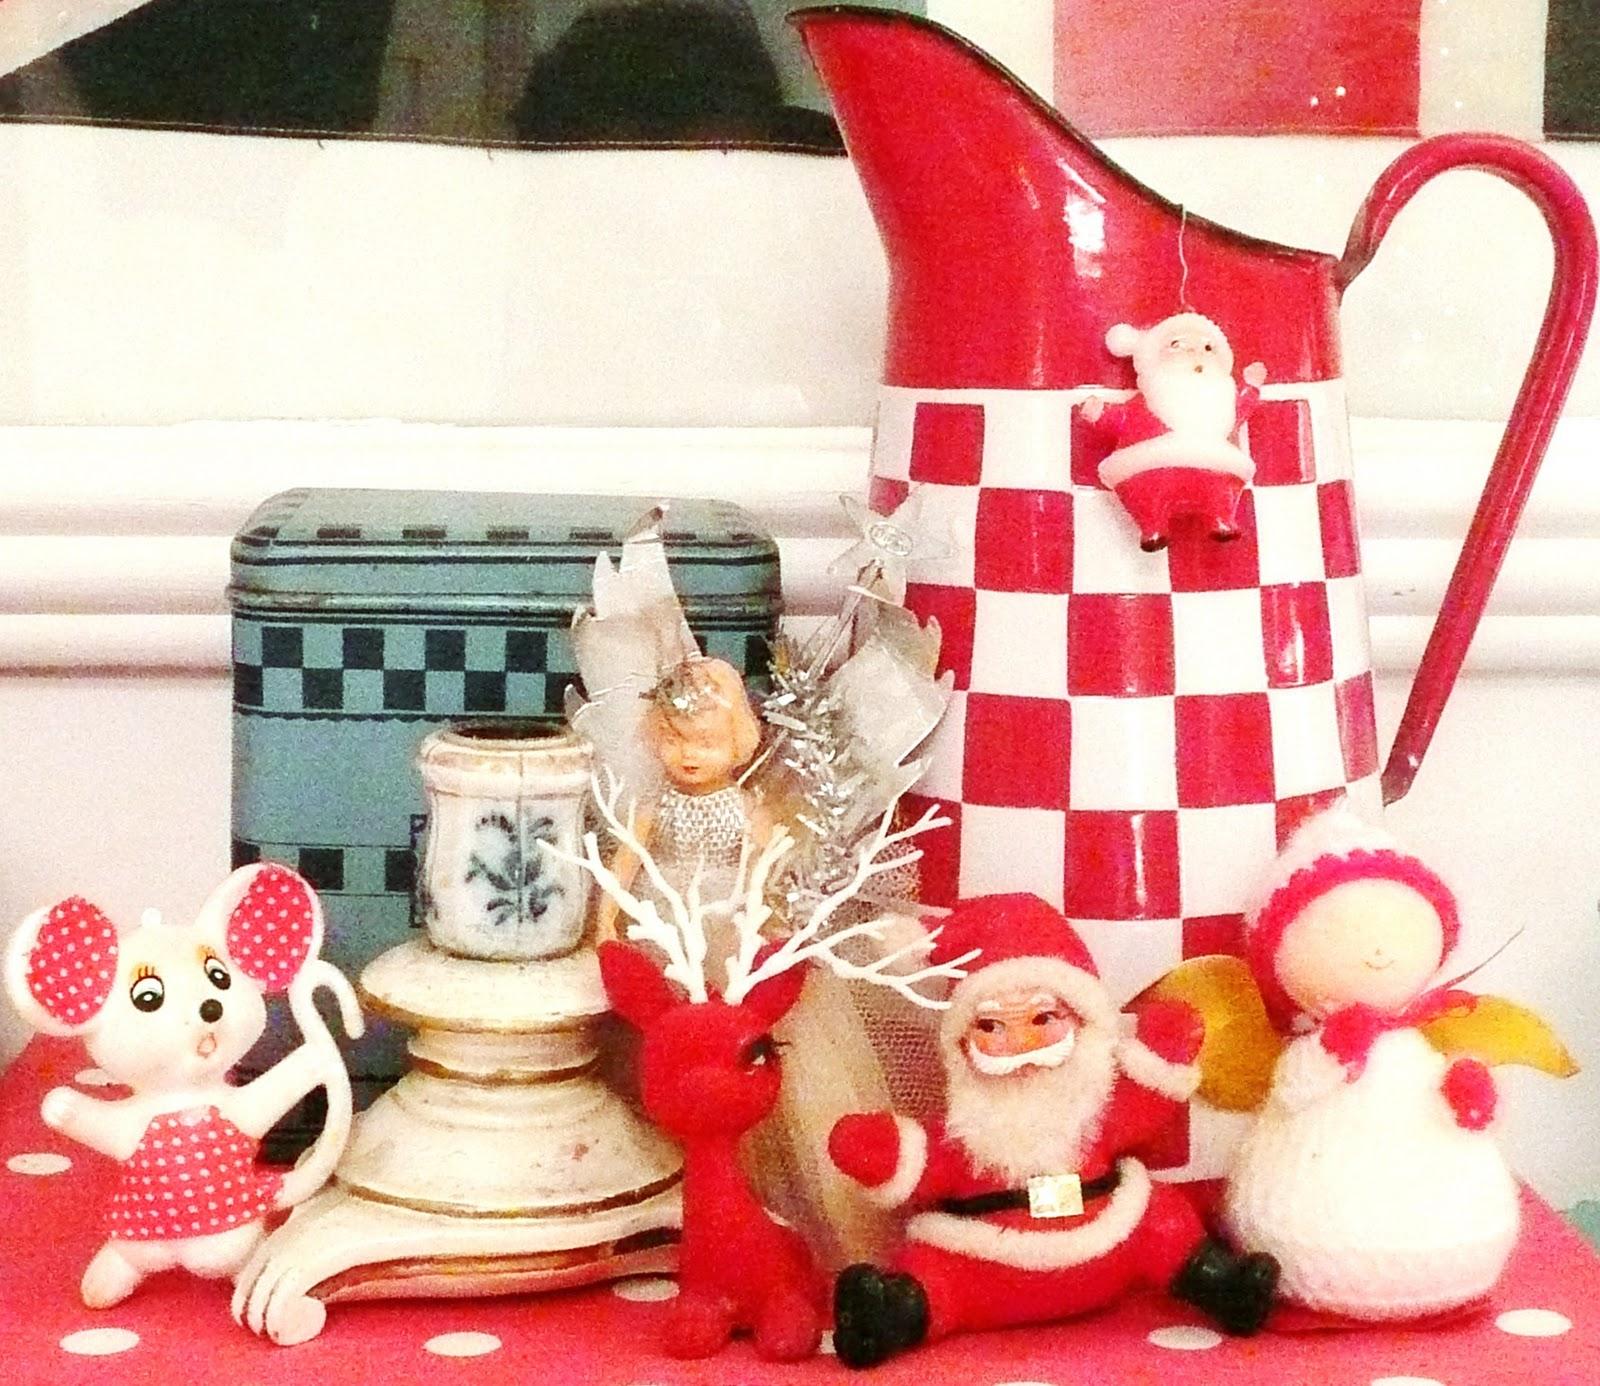 Vintage oddment of christmas decorations